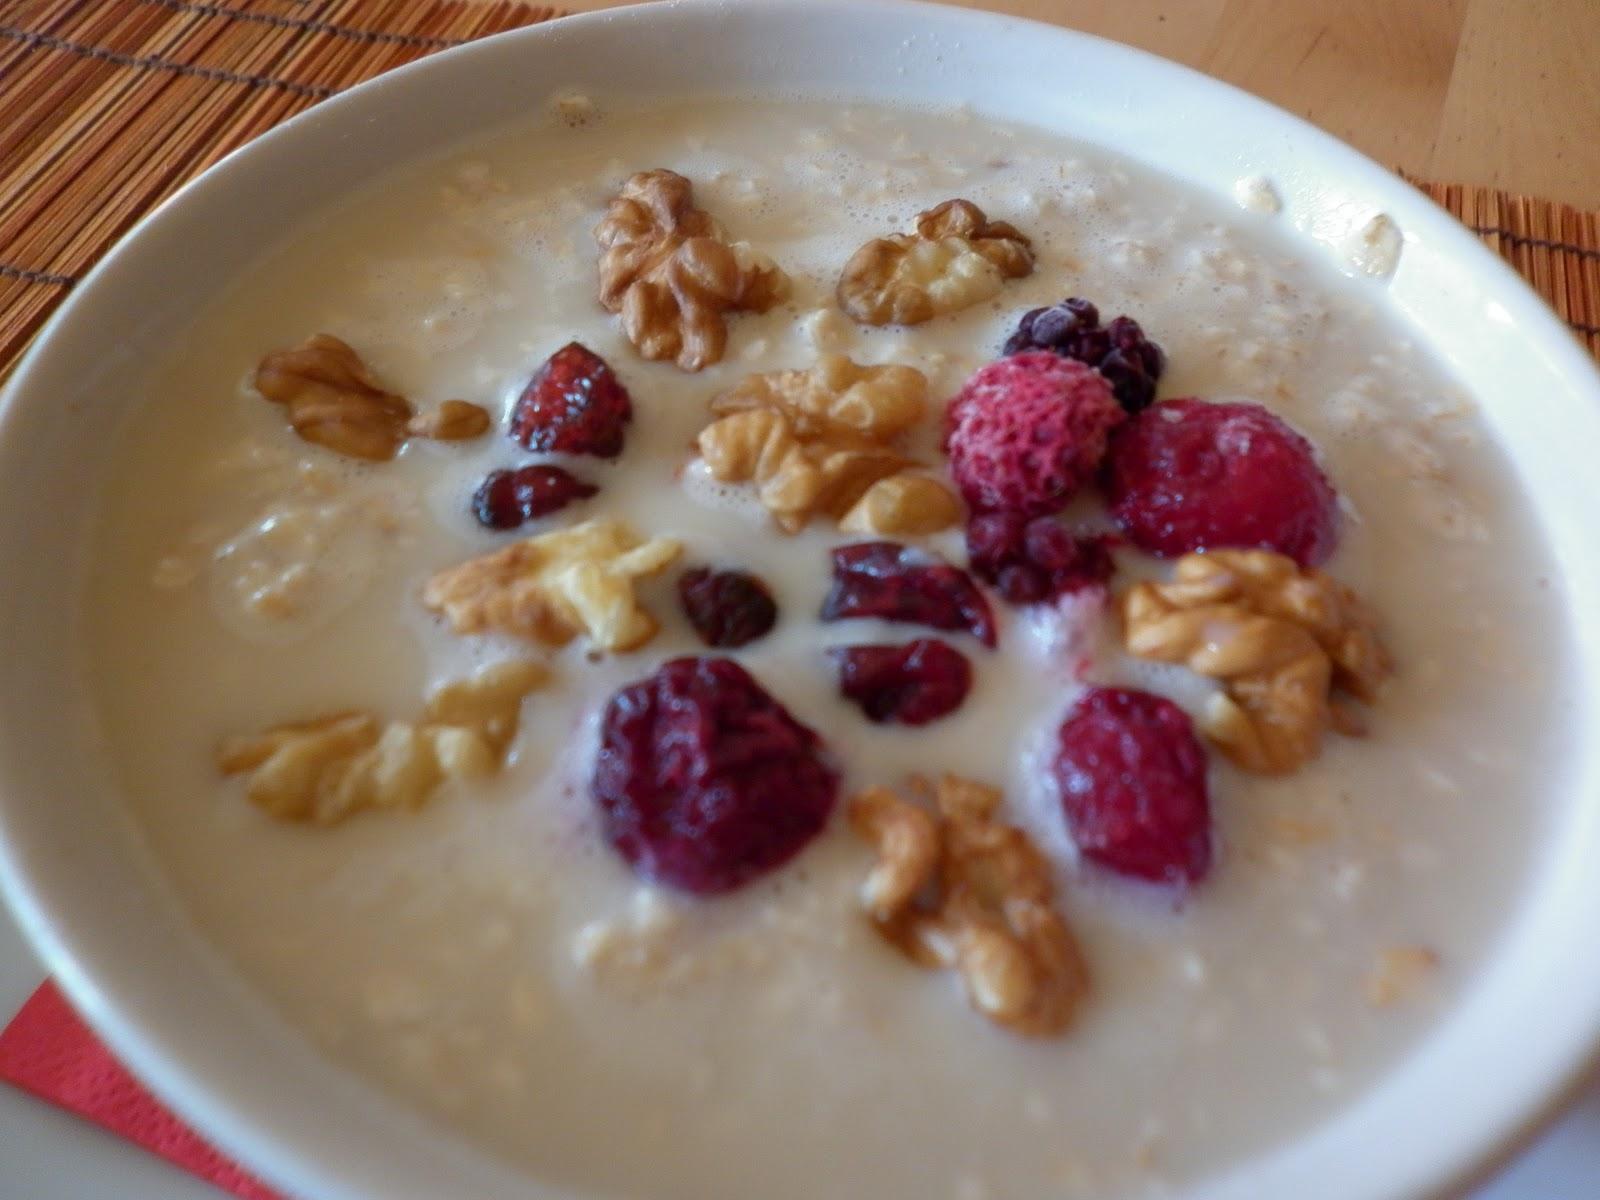 Cocina macrobi tica desayunos macrobi ticos dulces for Cocina macrobiotica